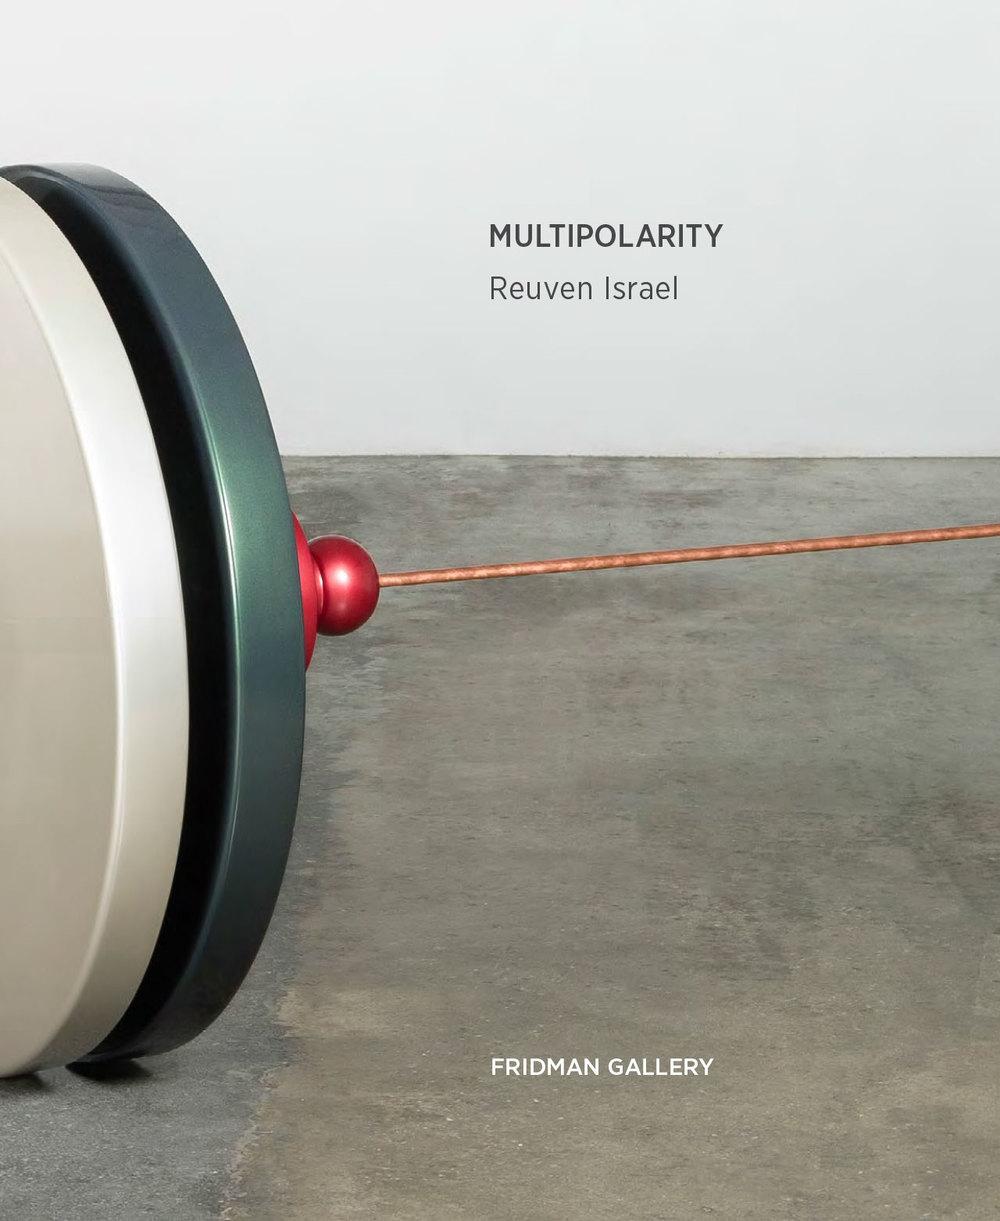 Reuven Israel, Multipolarity